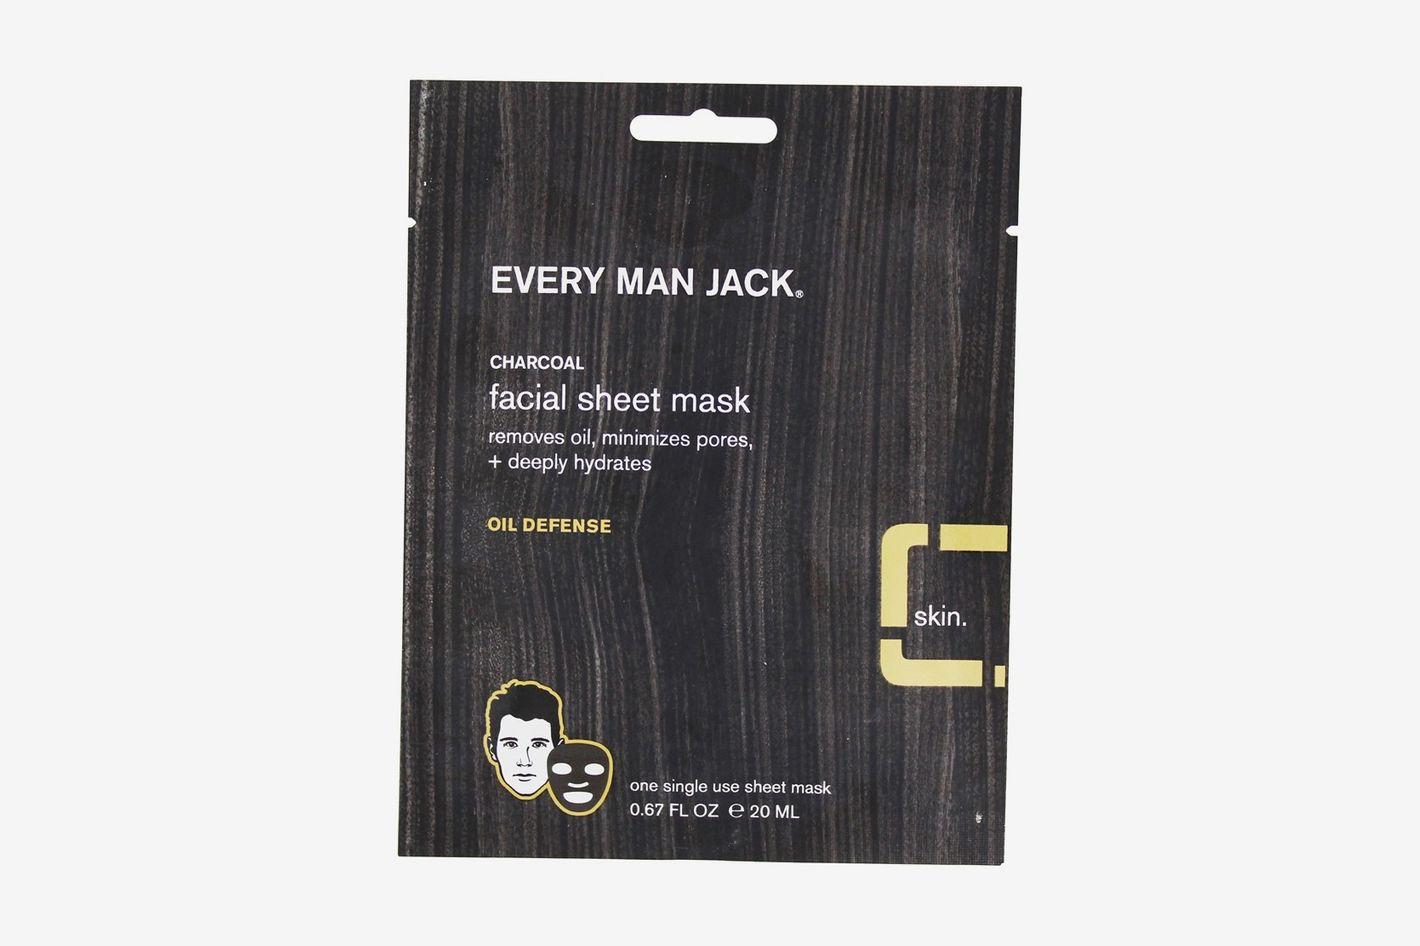 Every Man Jack Charcoal Facial Sheet Mask Oil Defense